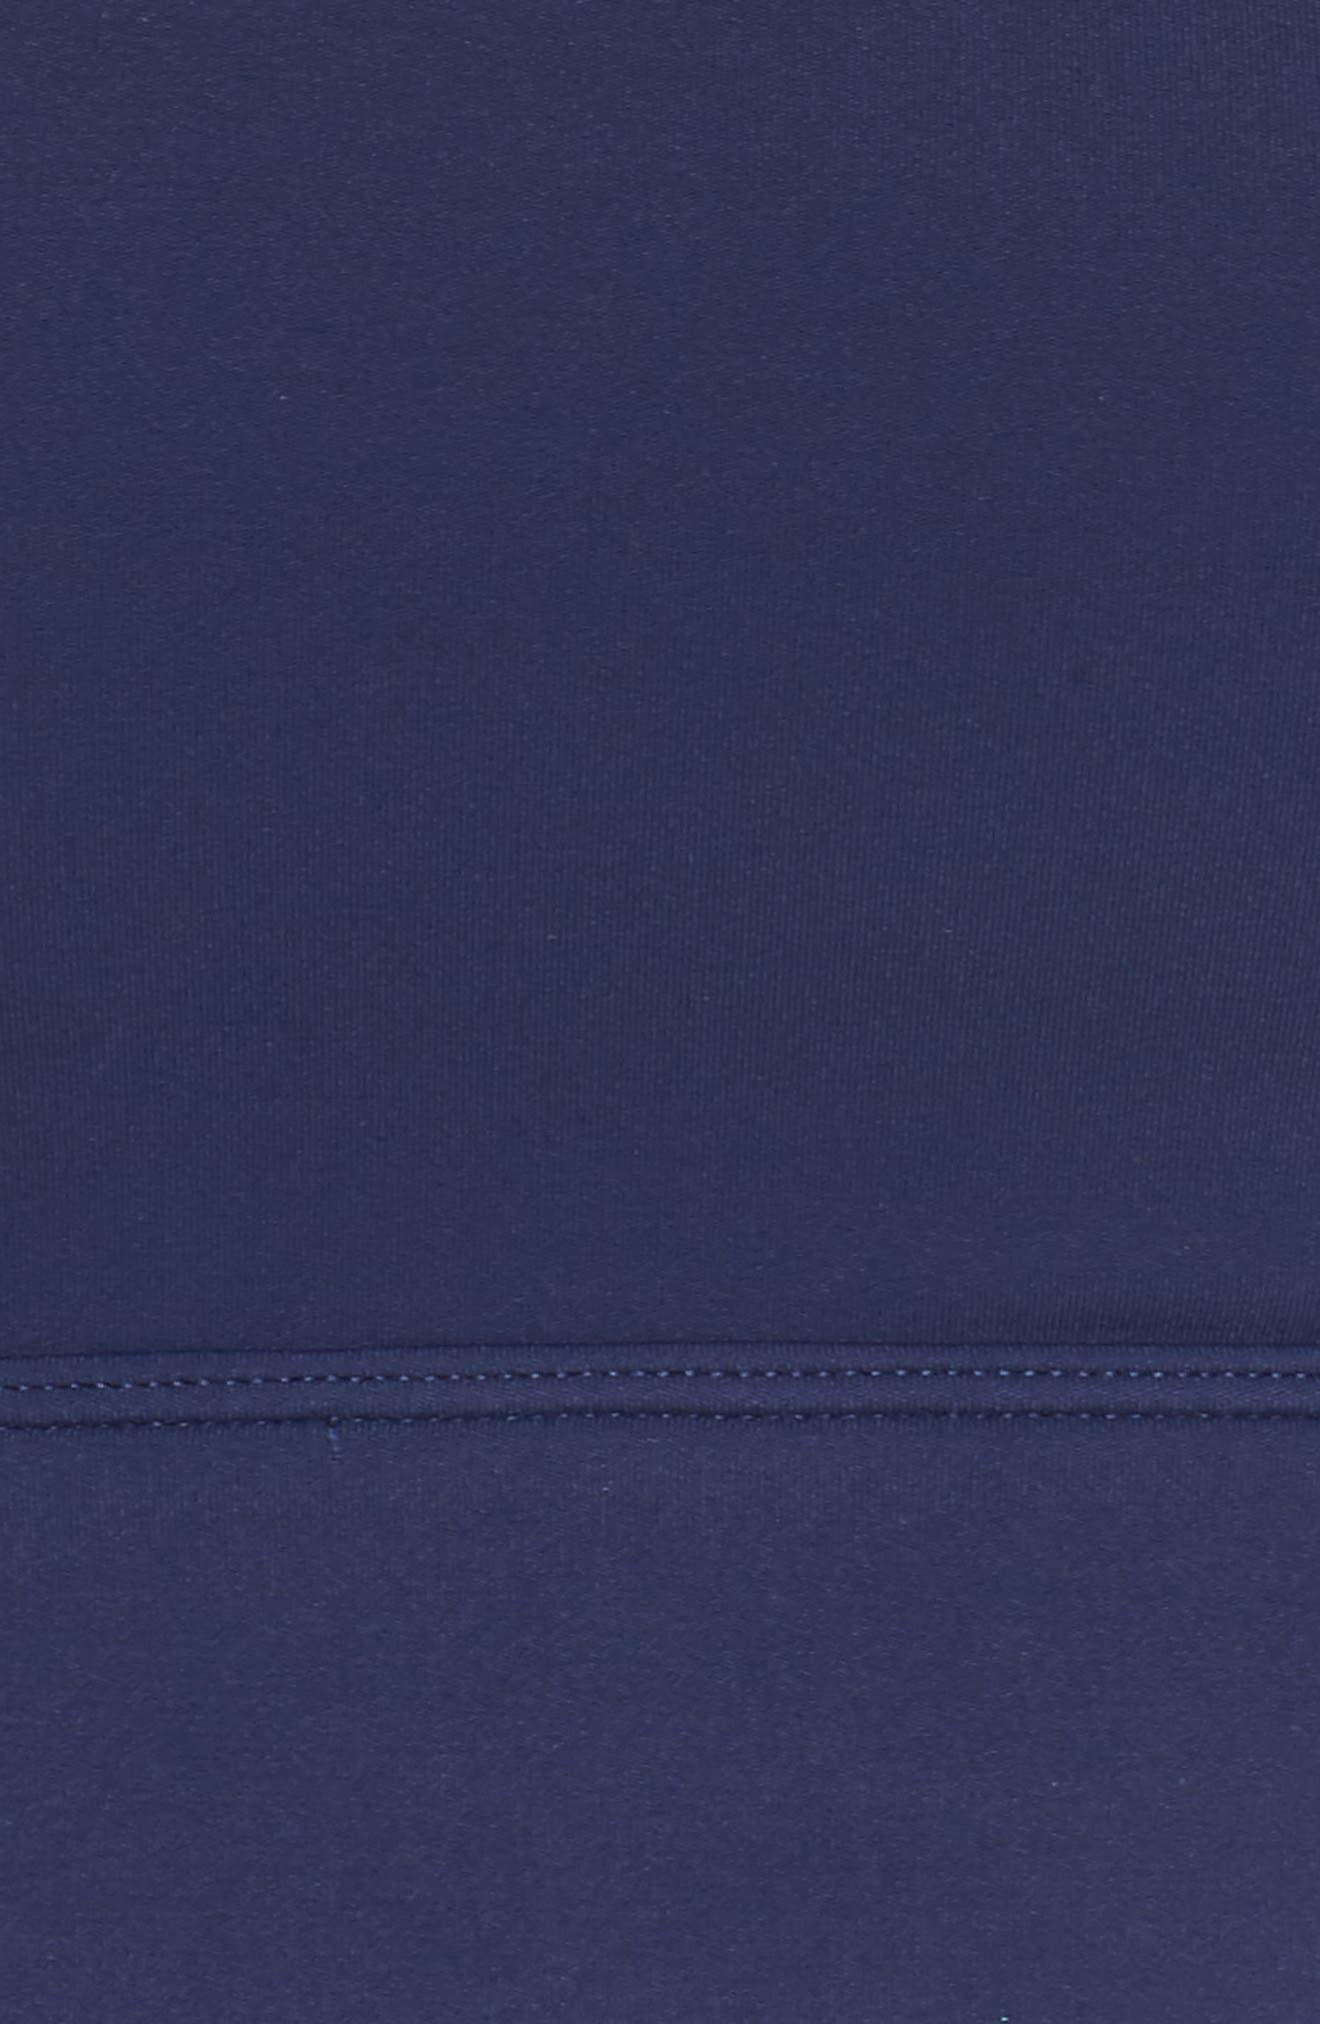 Feliz Sports Bra,                             Alternate thumbnail 6, color,                             Medieval Blue